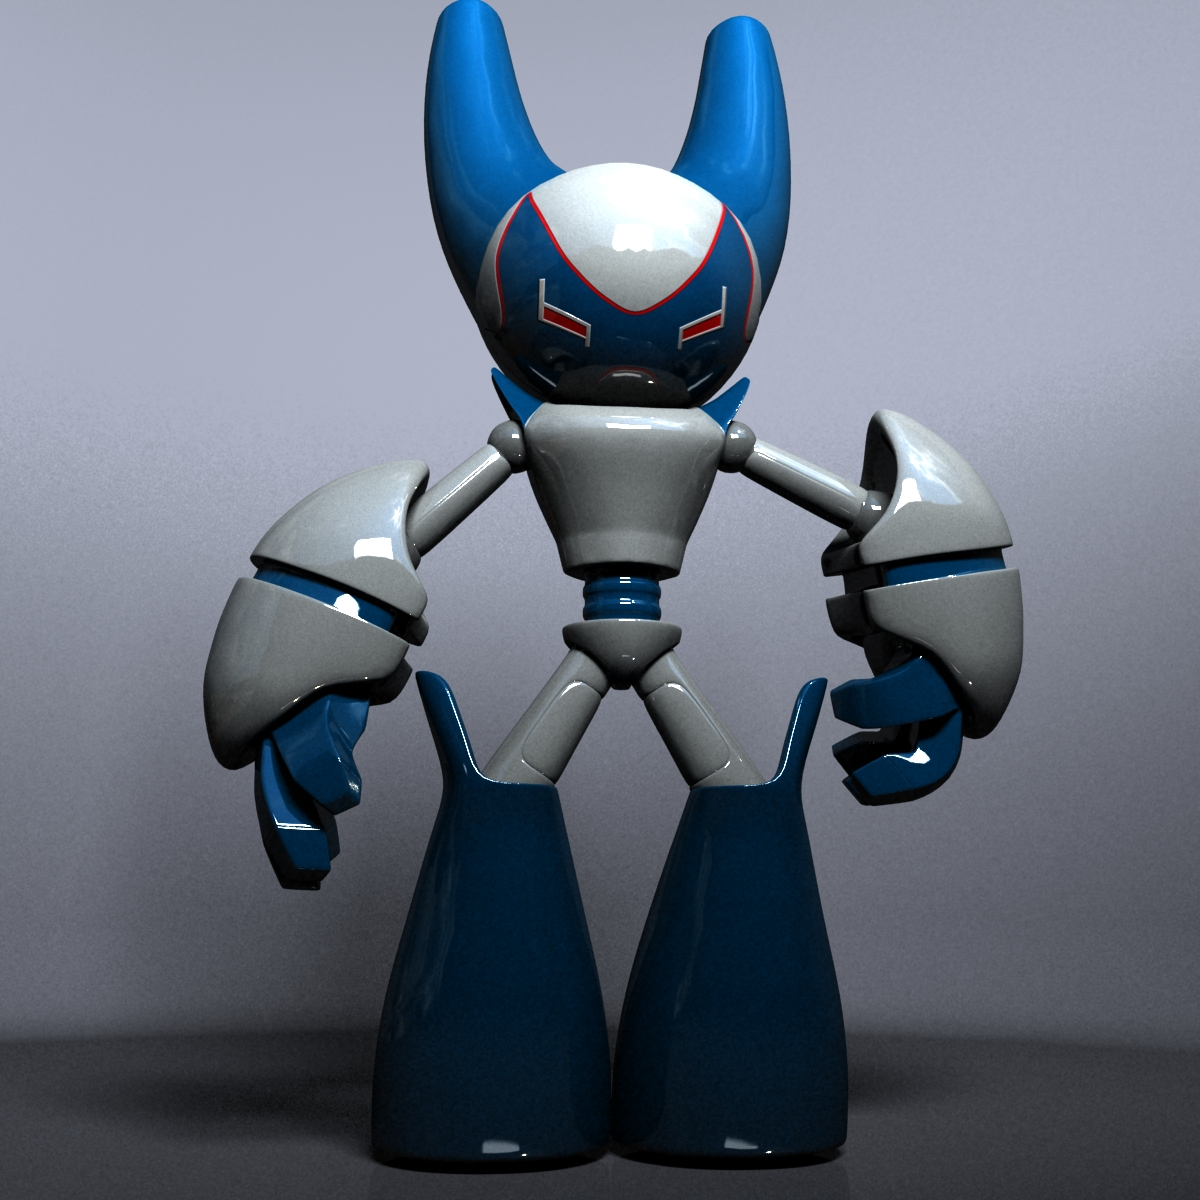 Cartoon Robot Toy : Robotboy d by dsud on deviantart